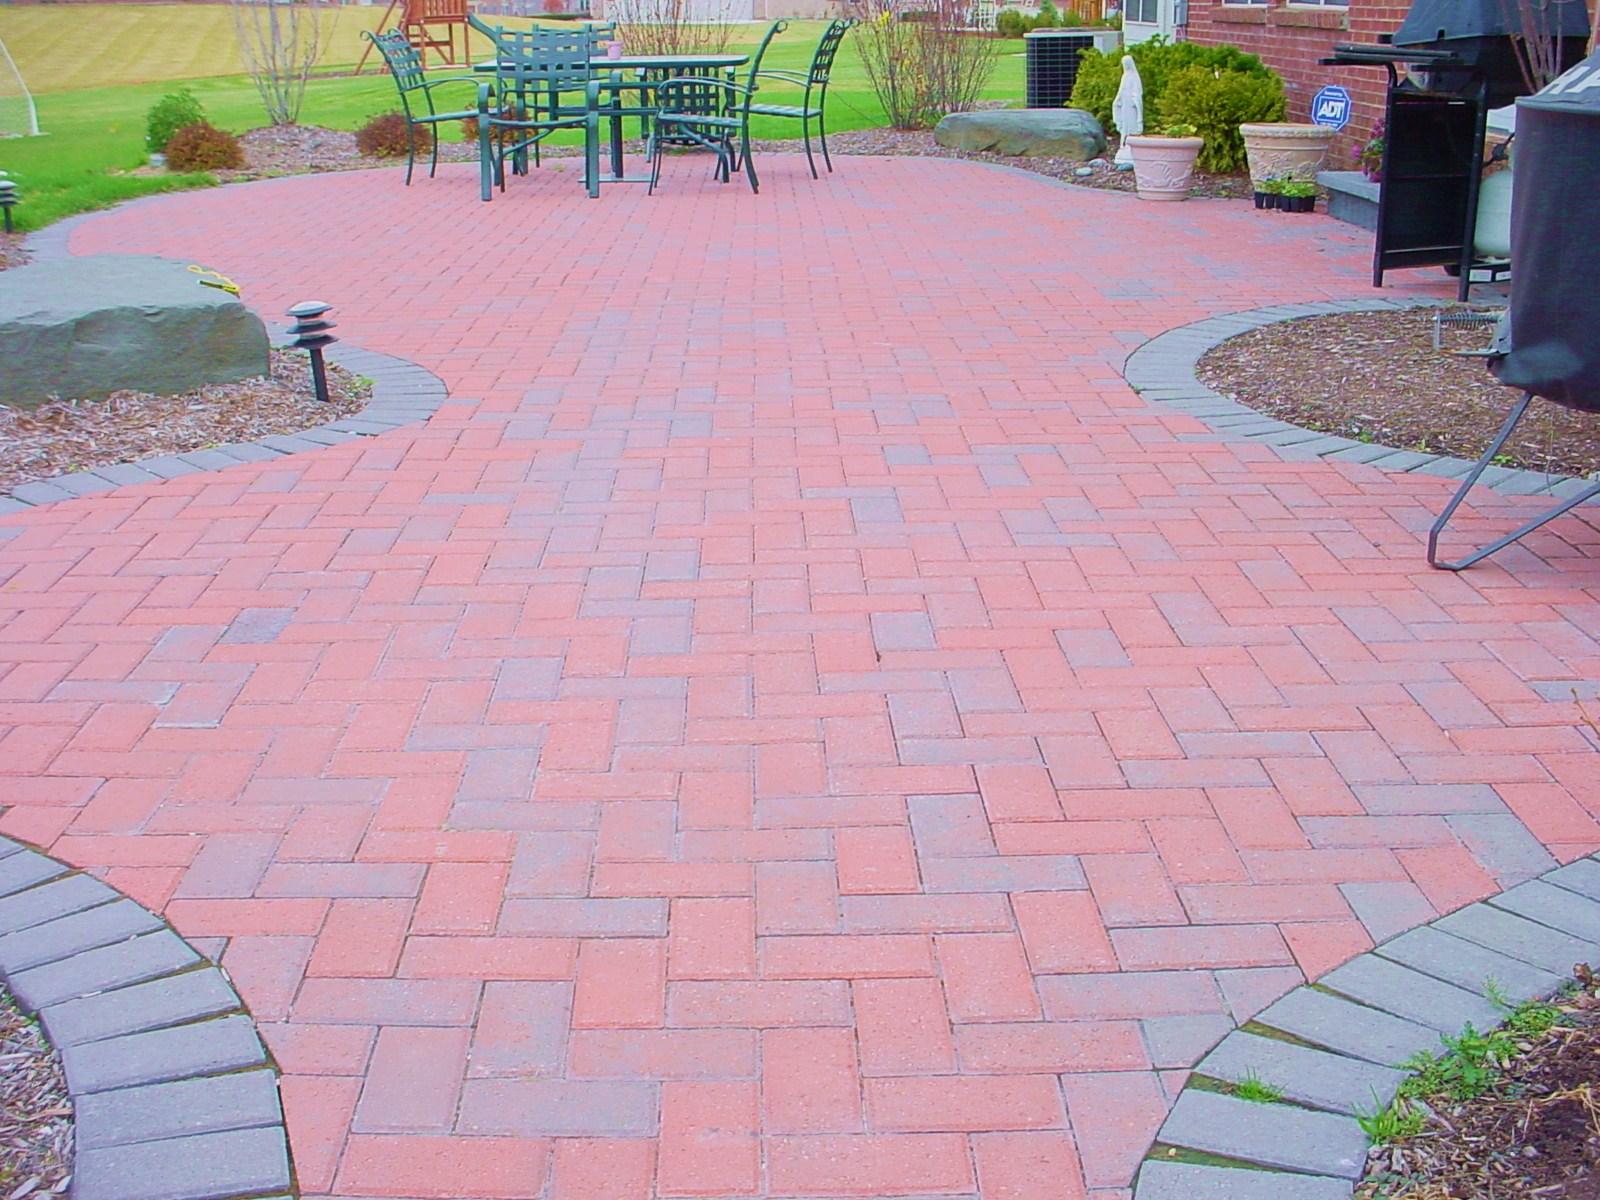 Brick pavers rustic red.jpg